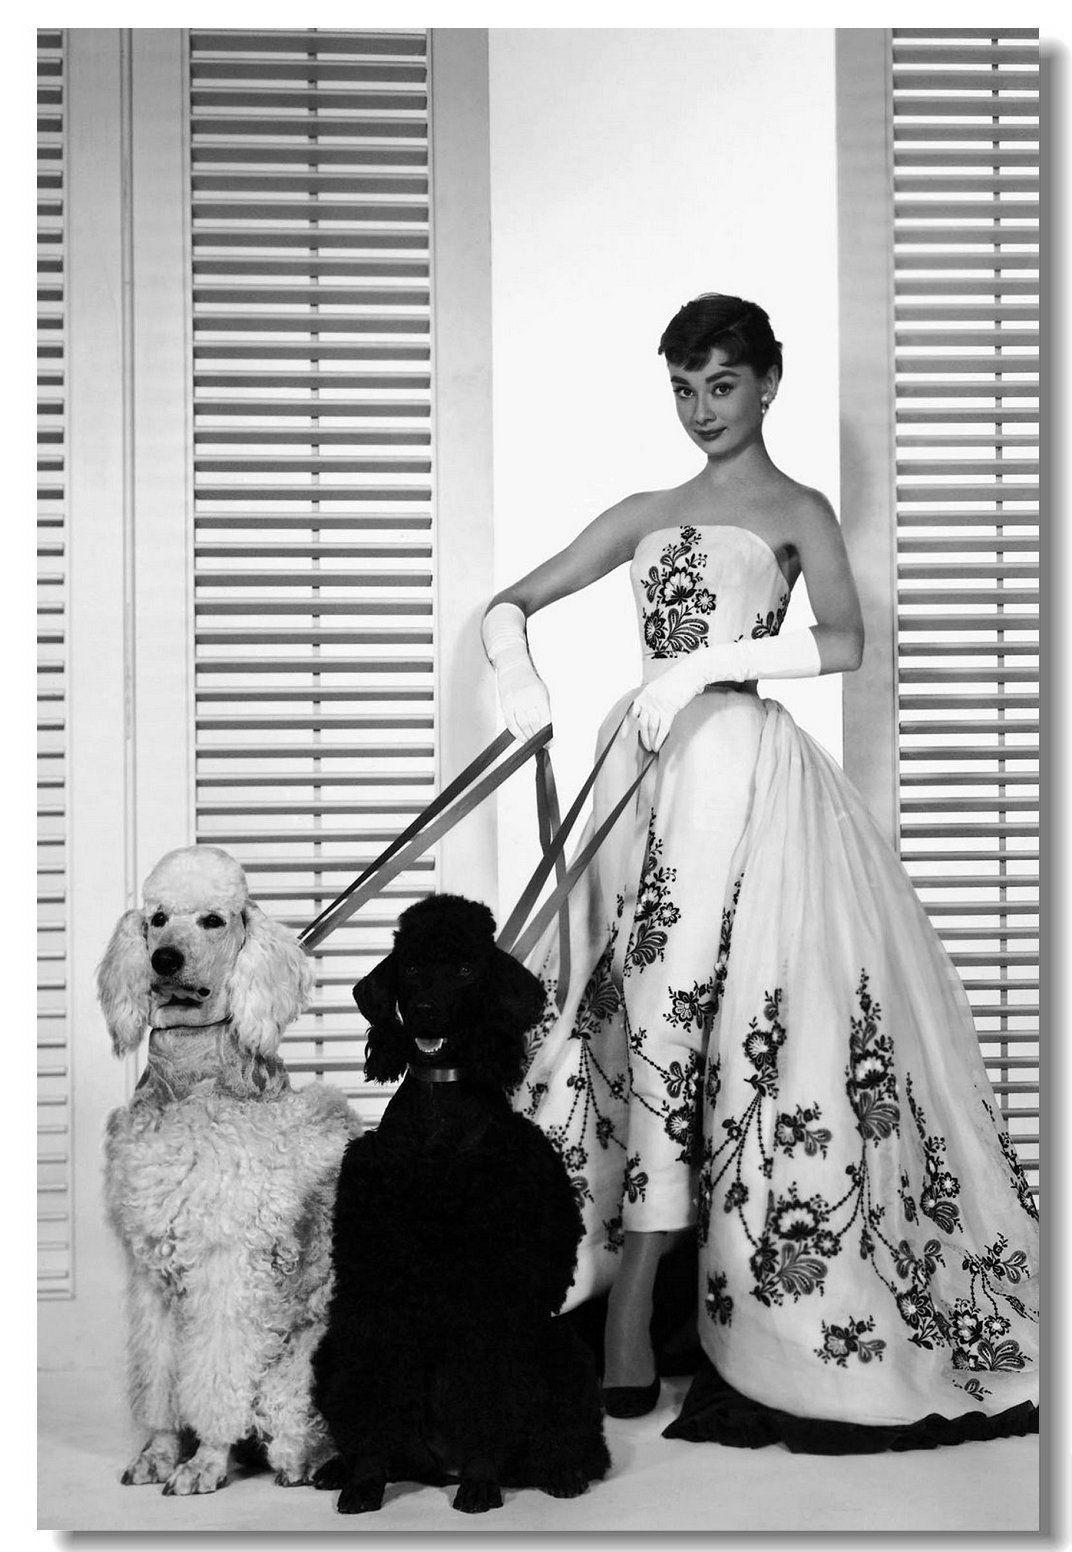 Audrey Hepburn Star Star Room Club Art Seda Póster 20x30 24x36 24x43